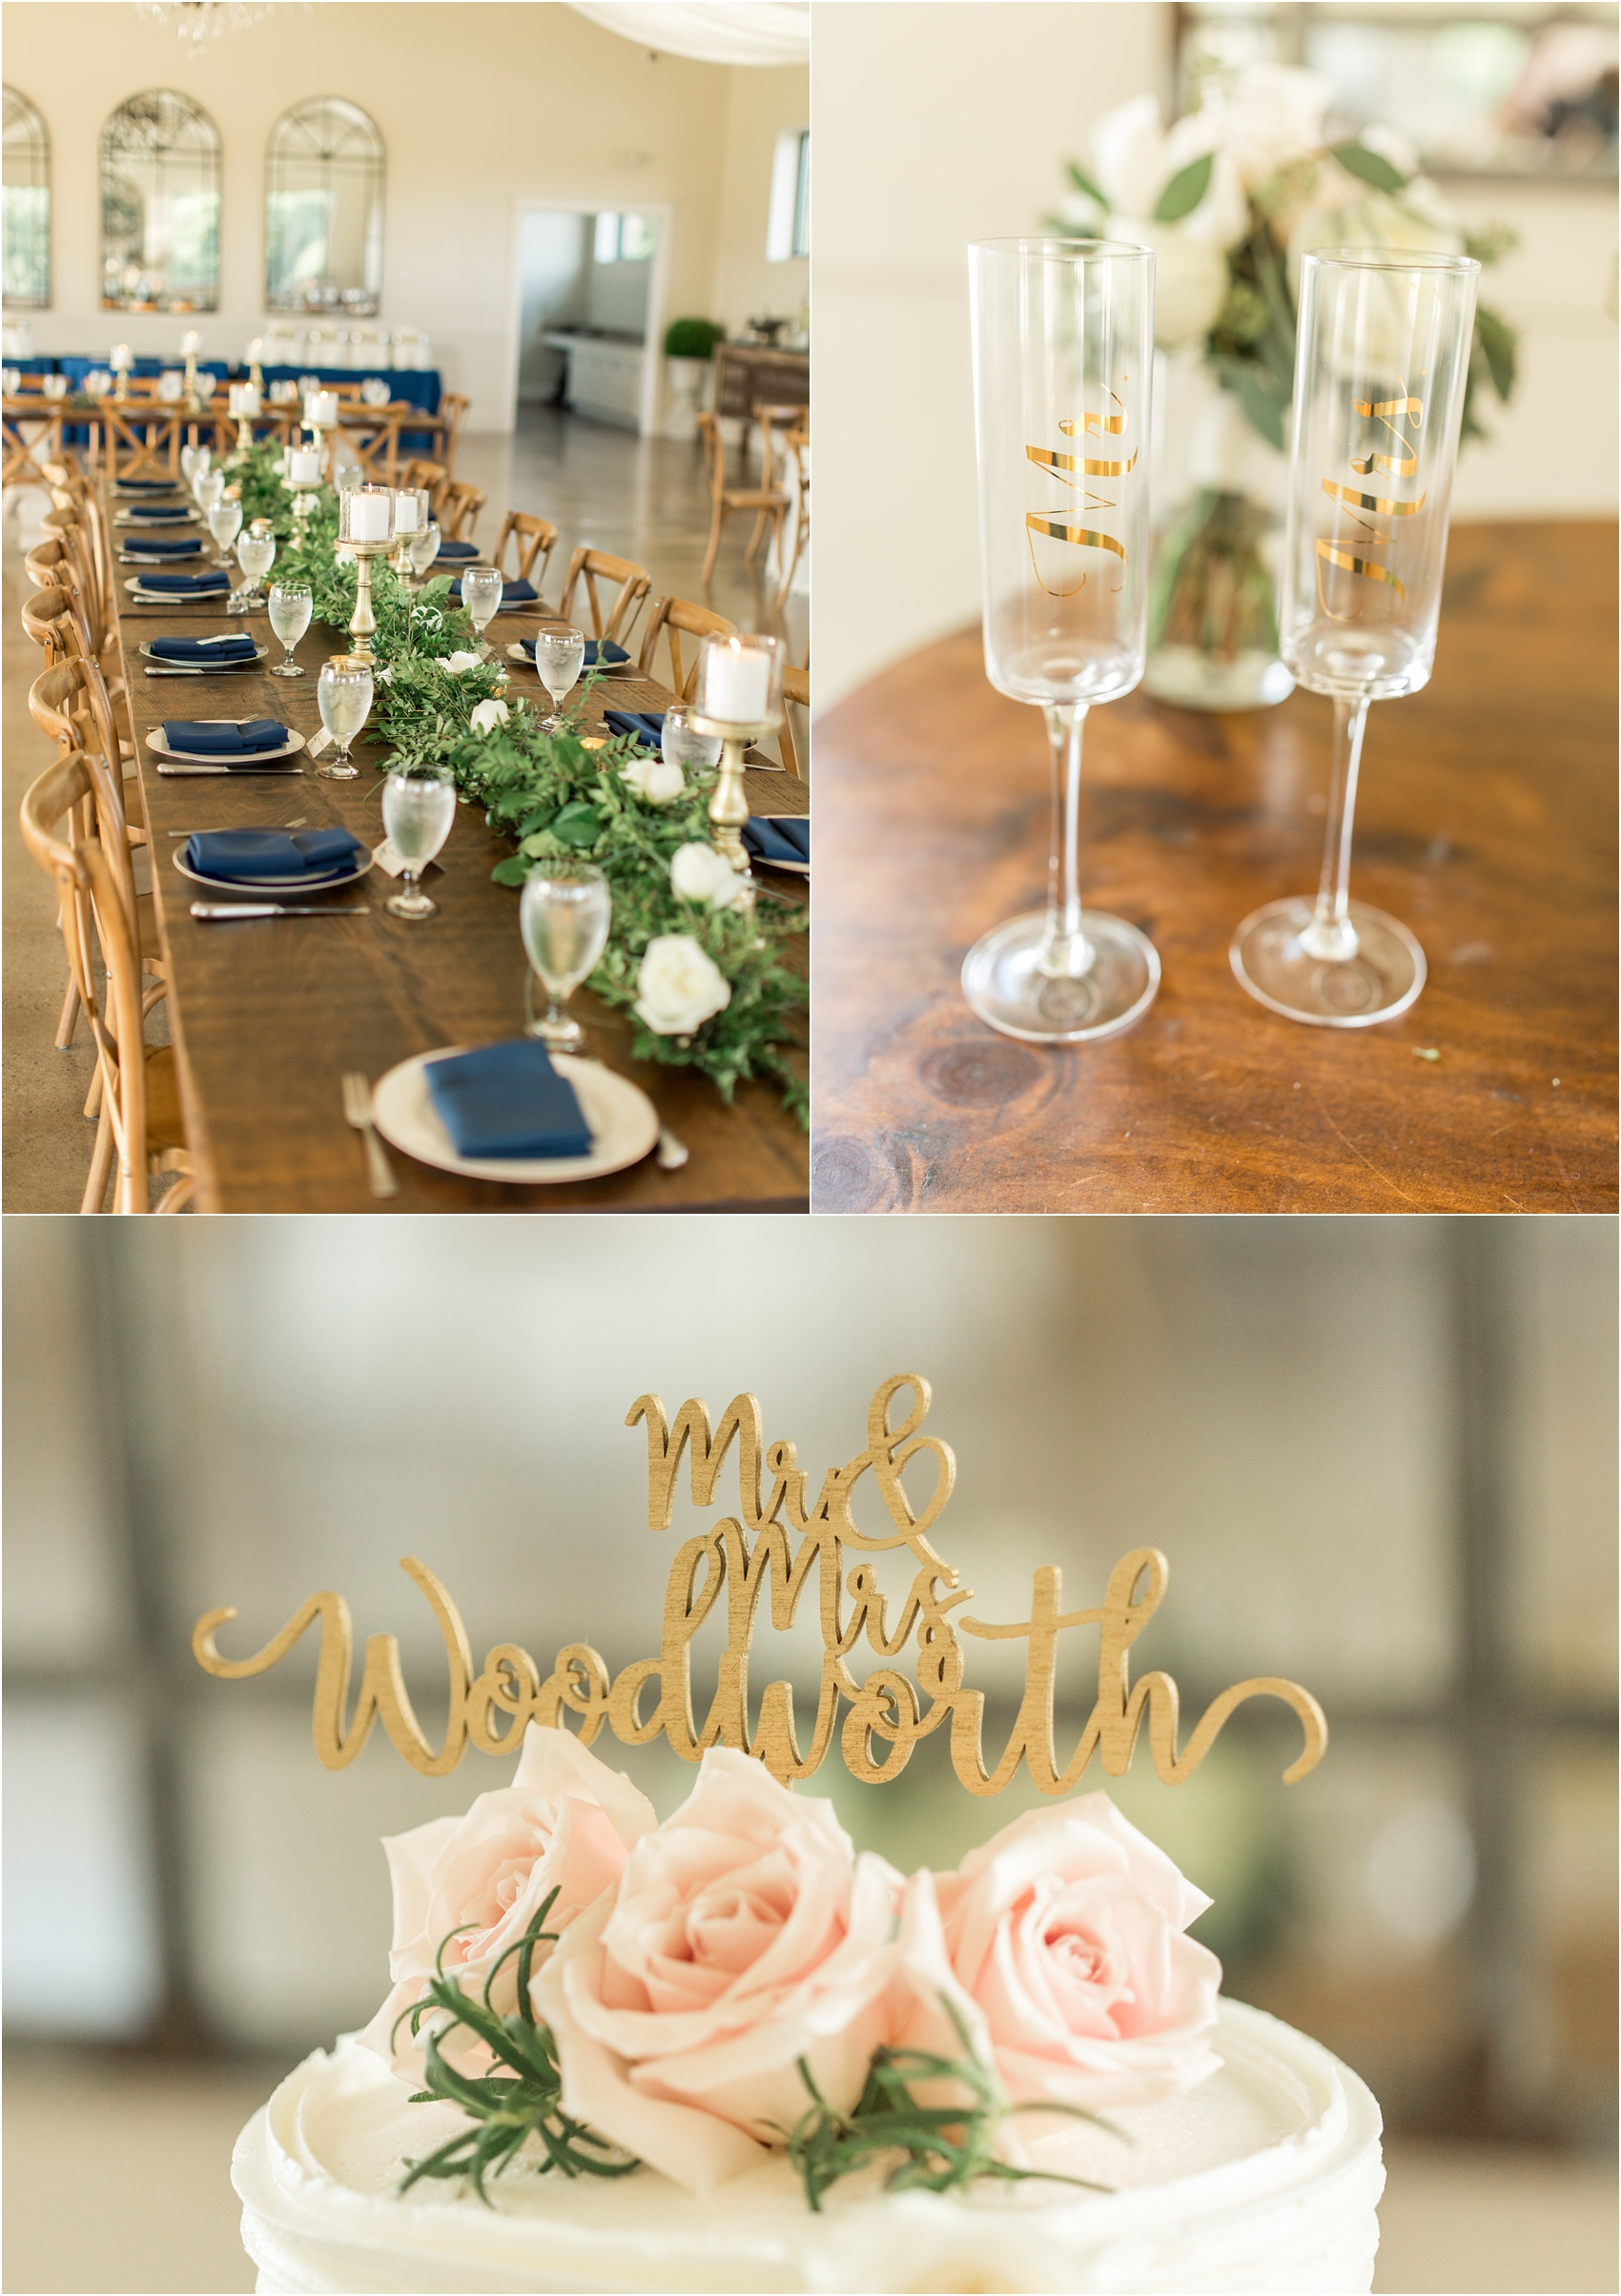 Savannah Eve Photography- Jurek-Woodworth Wedding- Sneak Peek-51.jpg